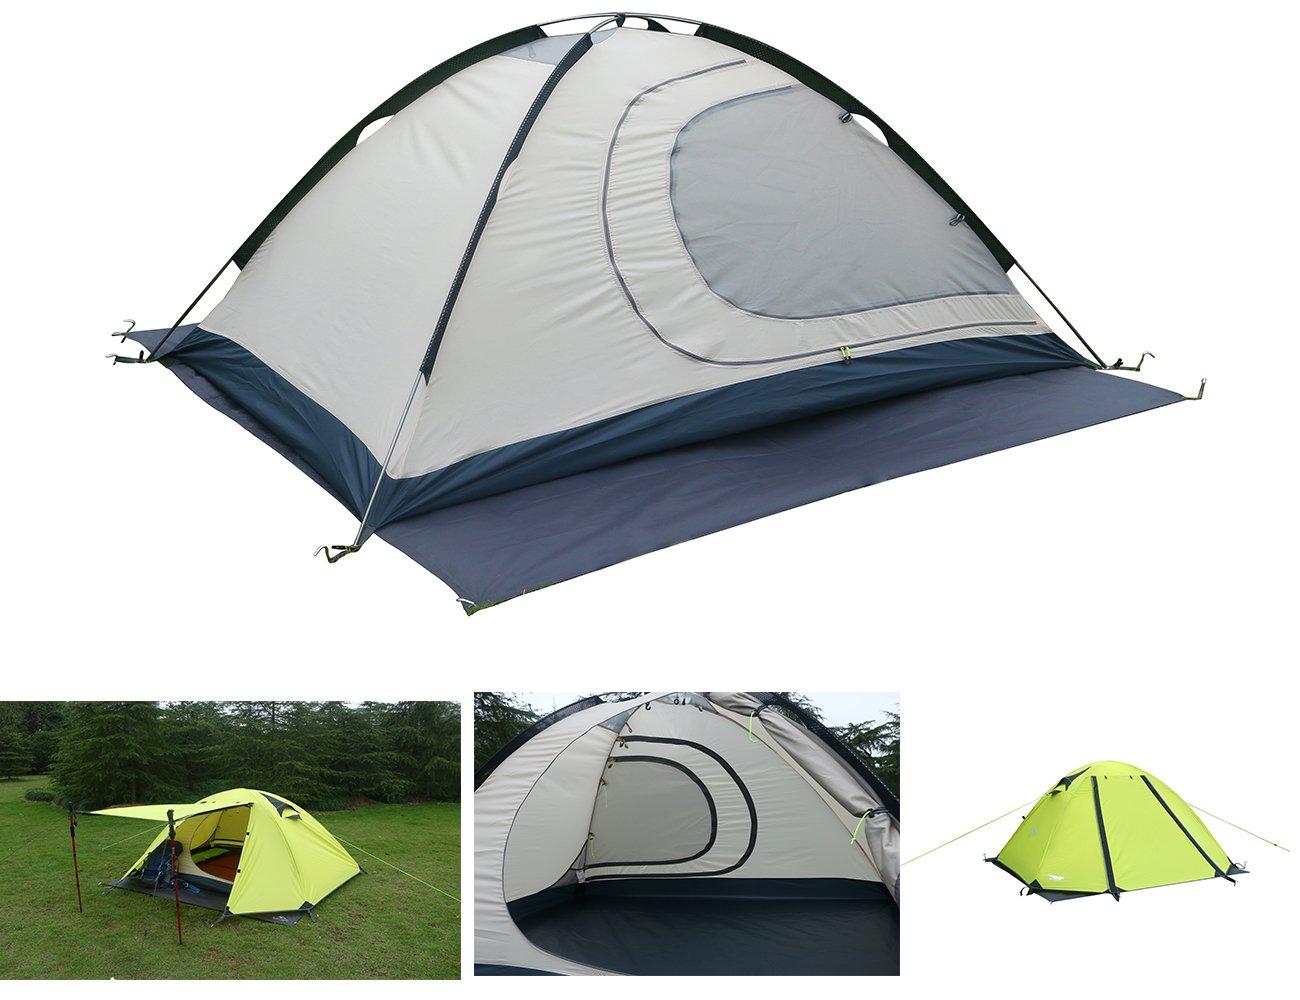 Luxe Tempo Hochwertiges Wasserdicht Zelt 2 Personen Trekkingzelt Campingzelt Innovativ Innenzelt (210cm+140cm+110cm)